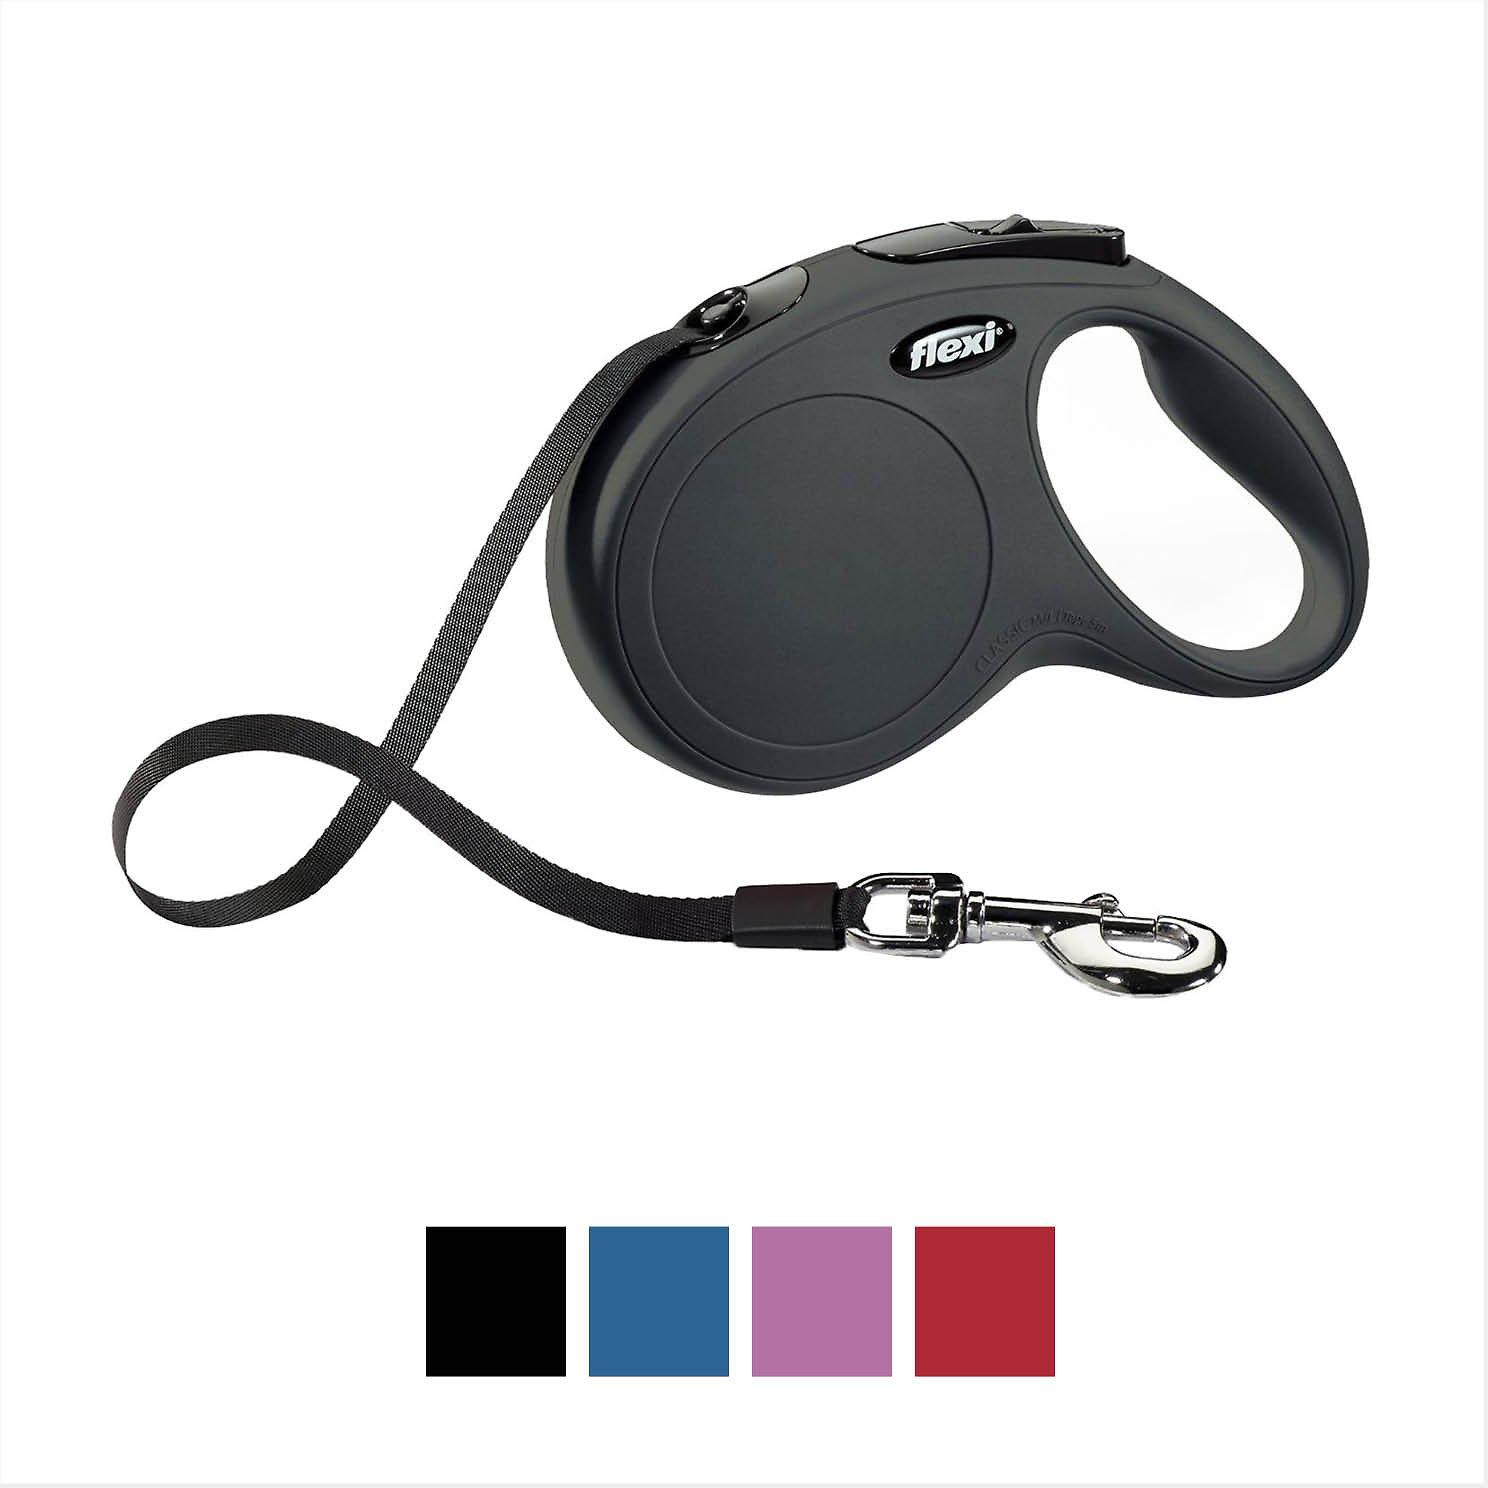 Flexi New Classic Retractable Tape Dog Leash Image